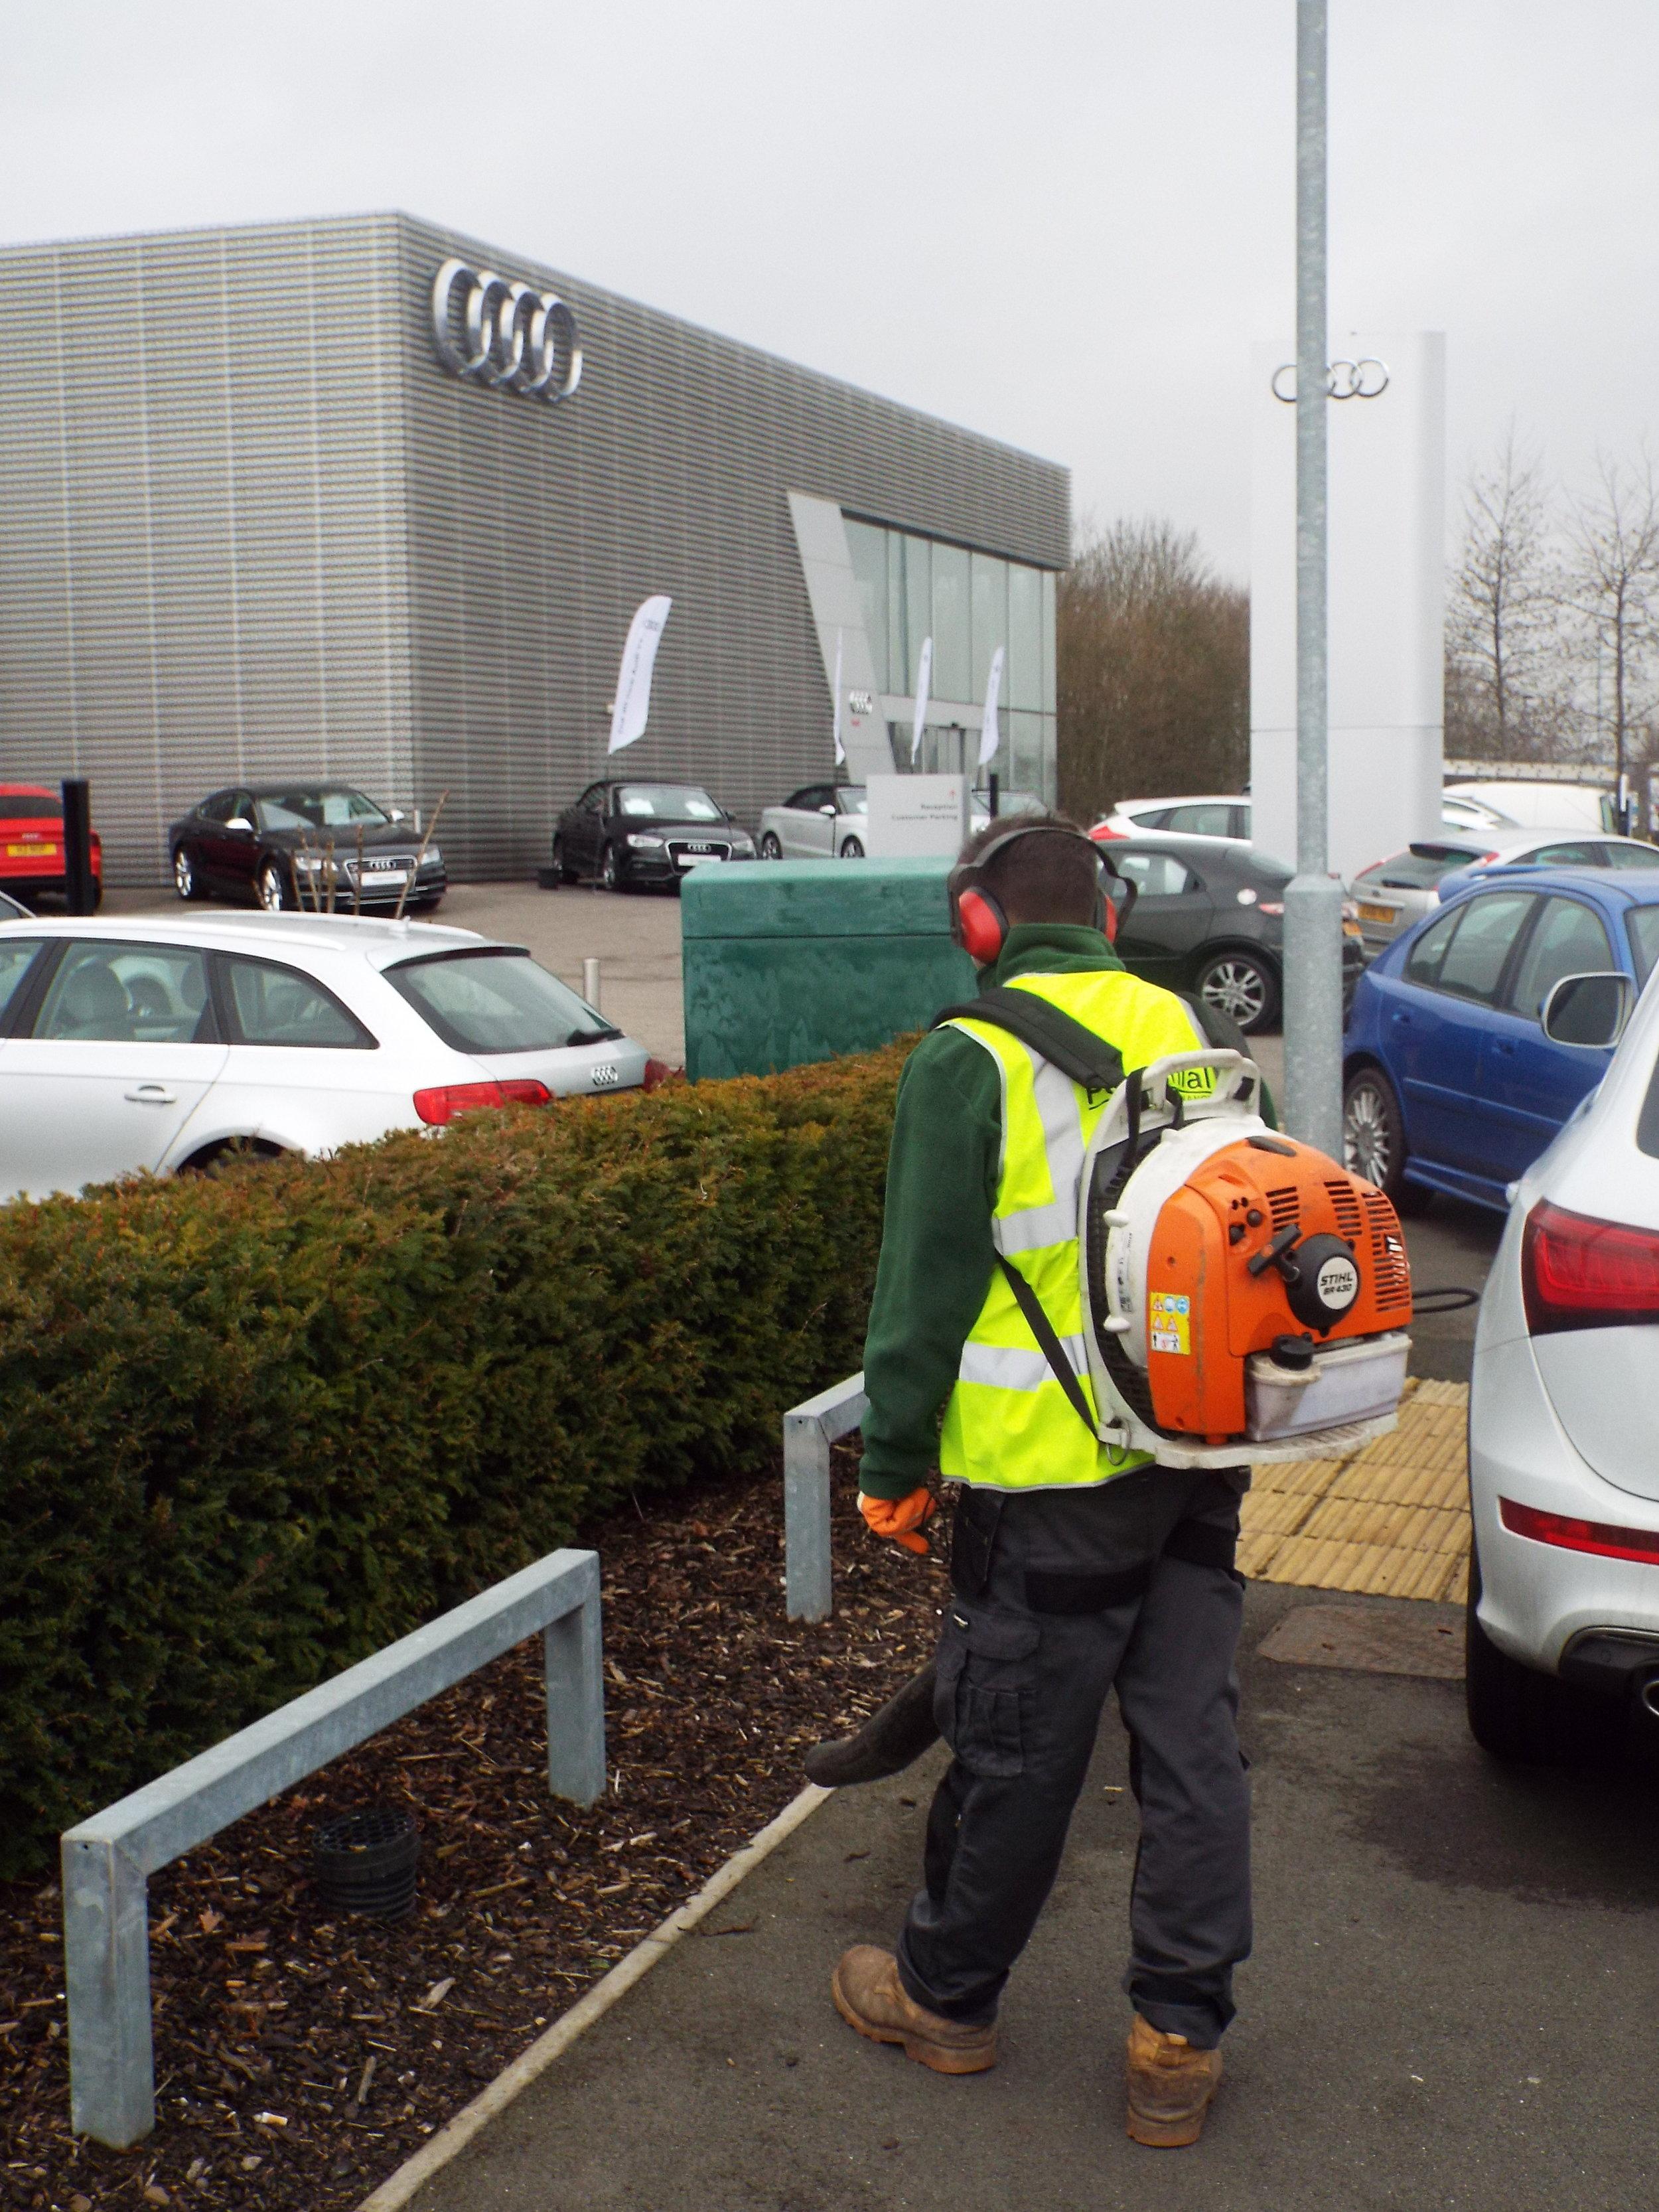 Man using a leaf blower at a car dealership